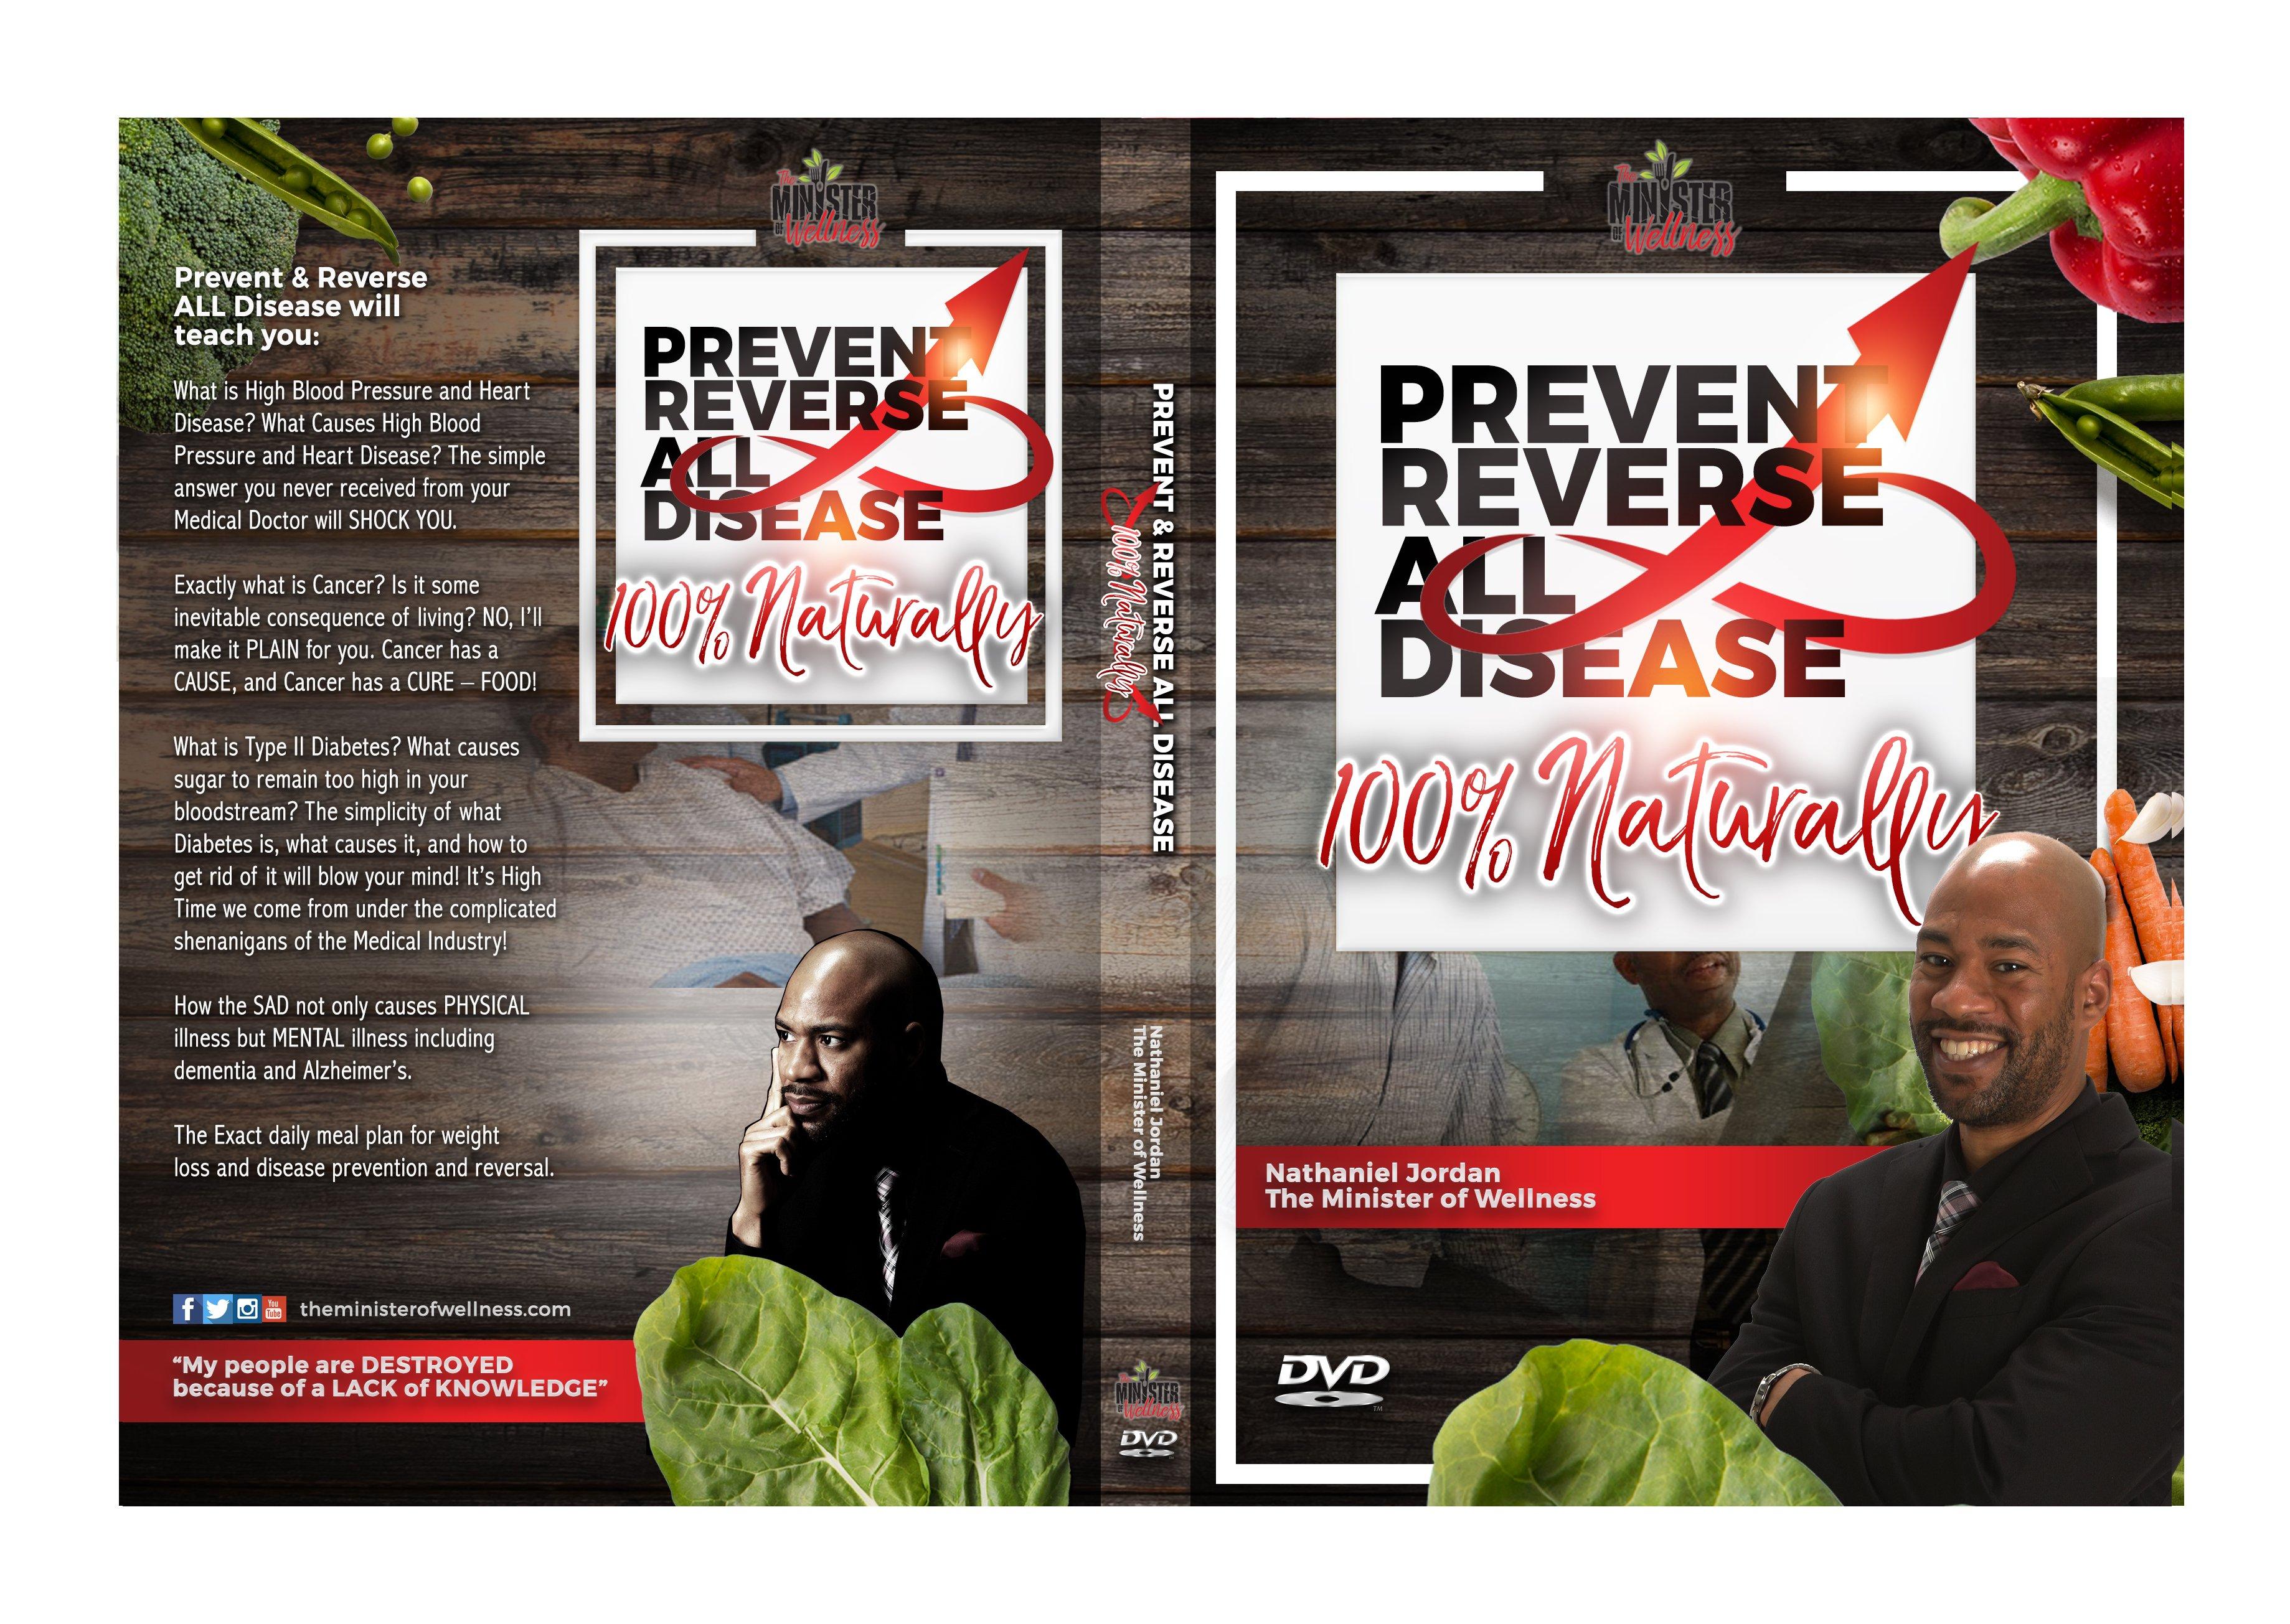 DVD: Prevent & Reverse ALL Disease 100% Naturally